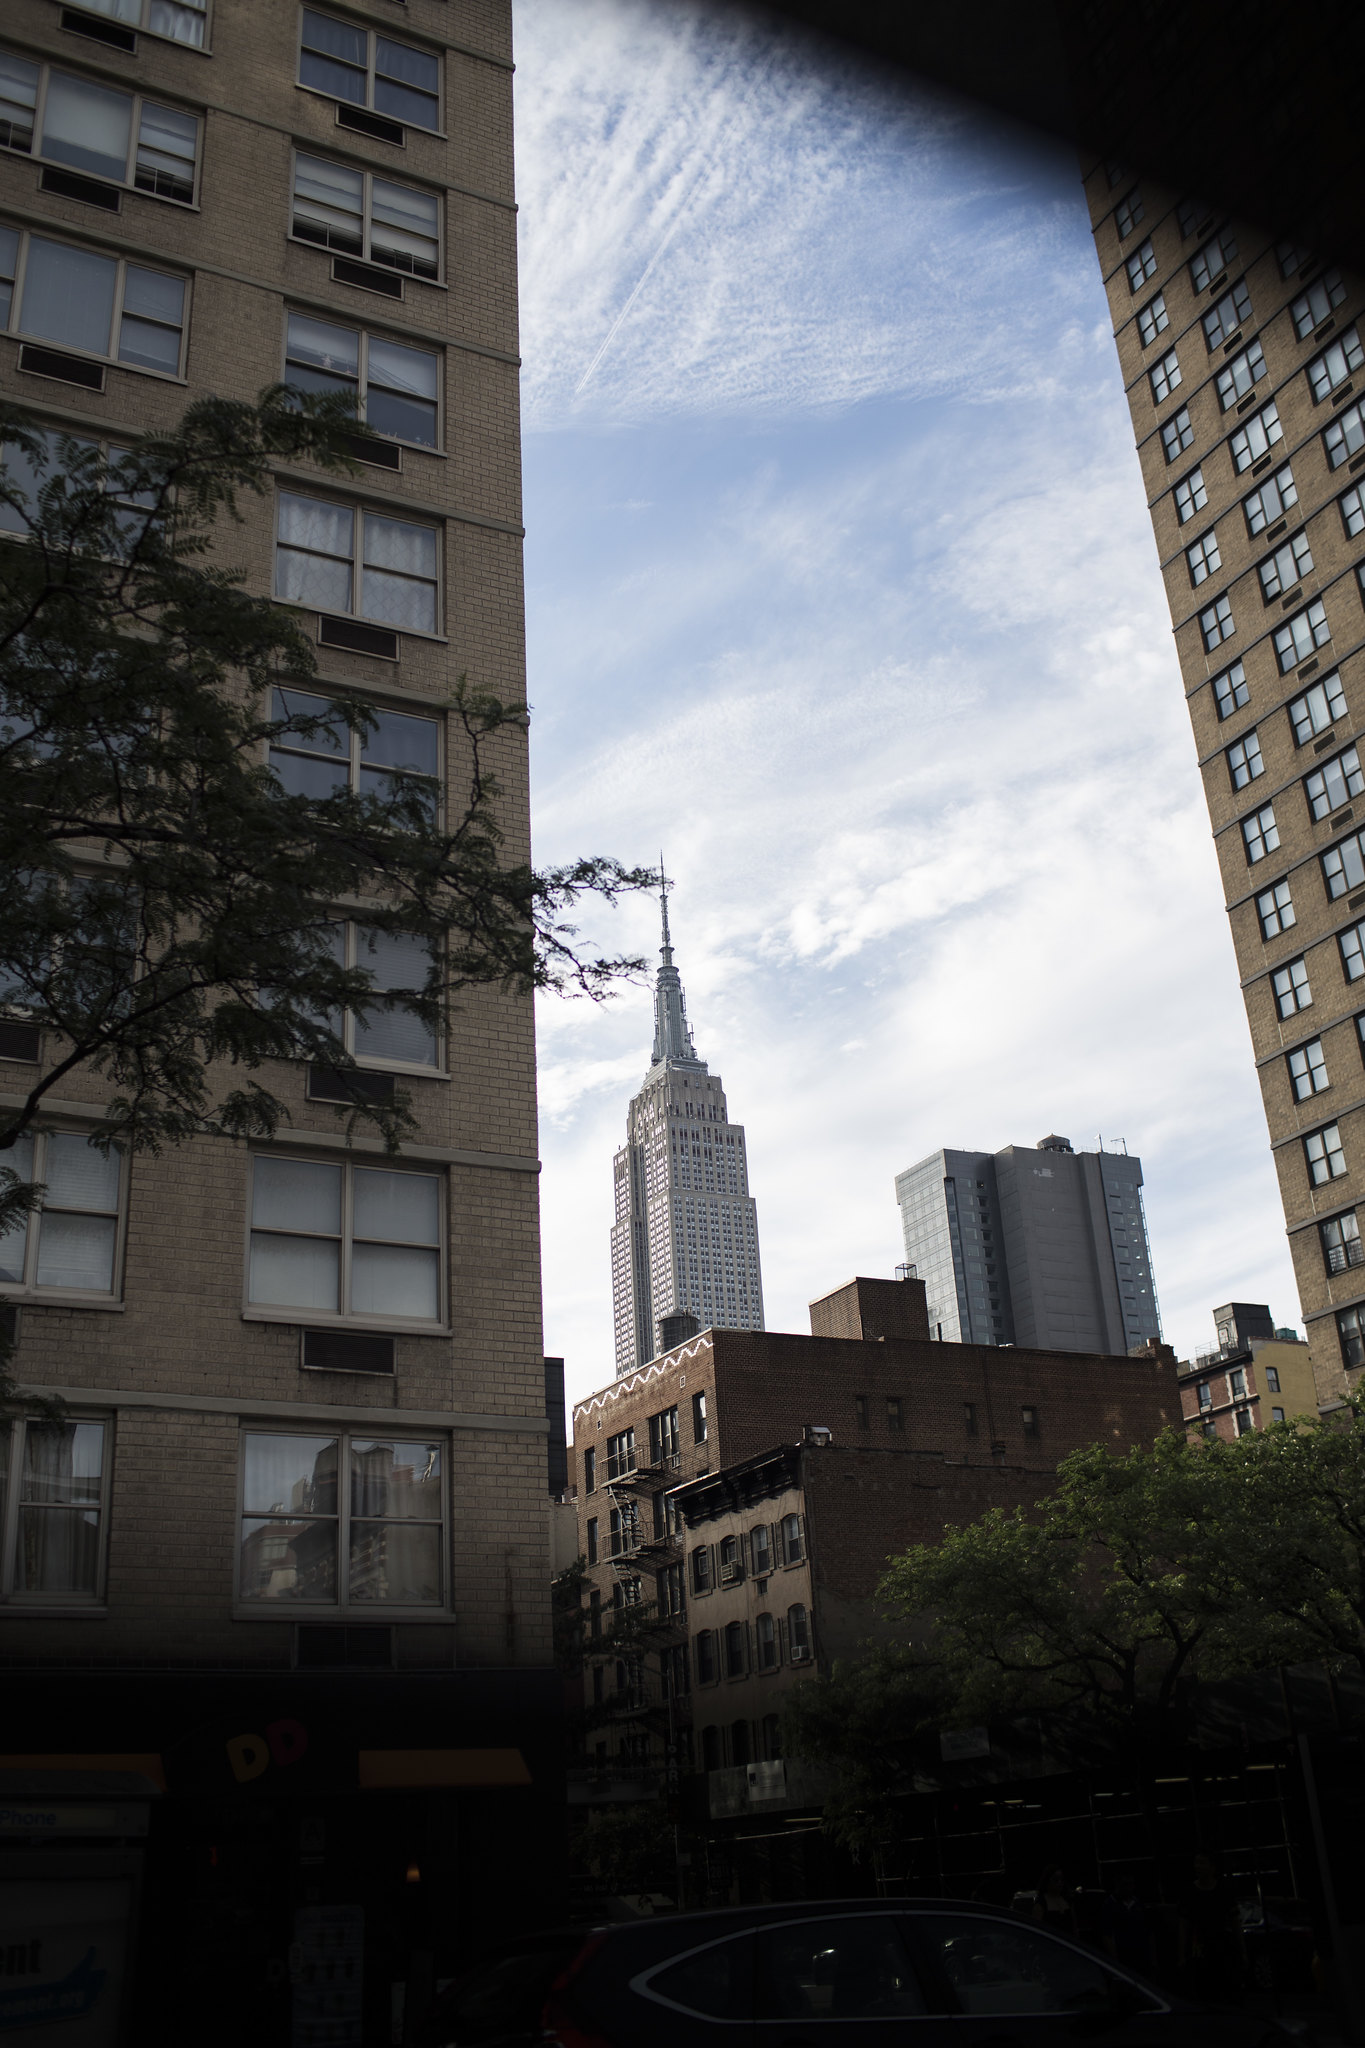 Jordan_Bunker_revisiting_new_york_40